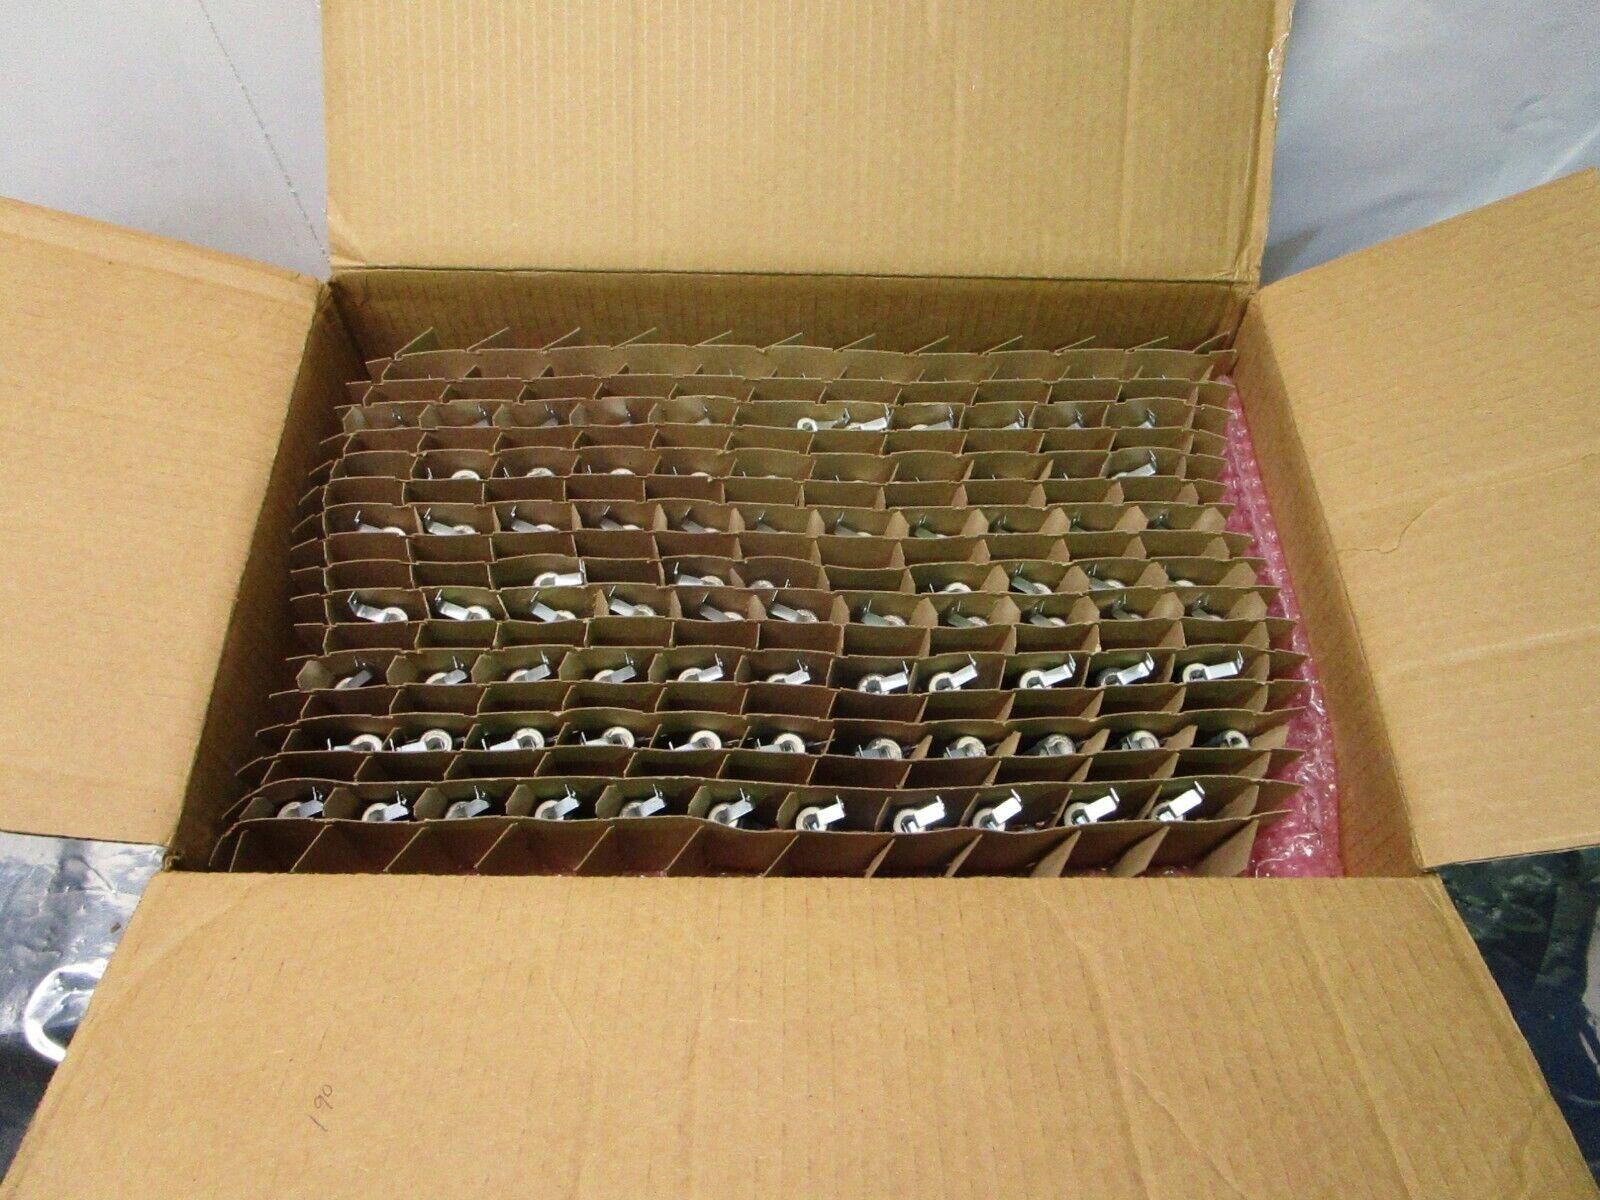 1 Lot of 190 Vishay FST02515E200R0JE92 Wirewound Resistor, 102463